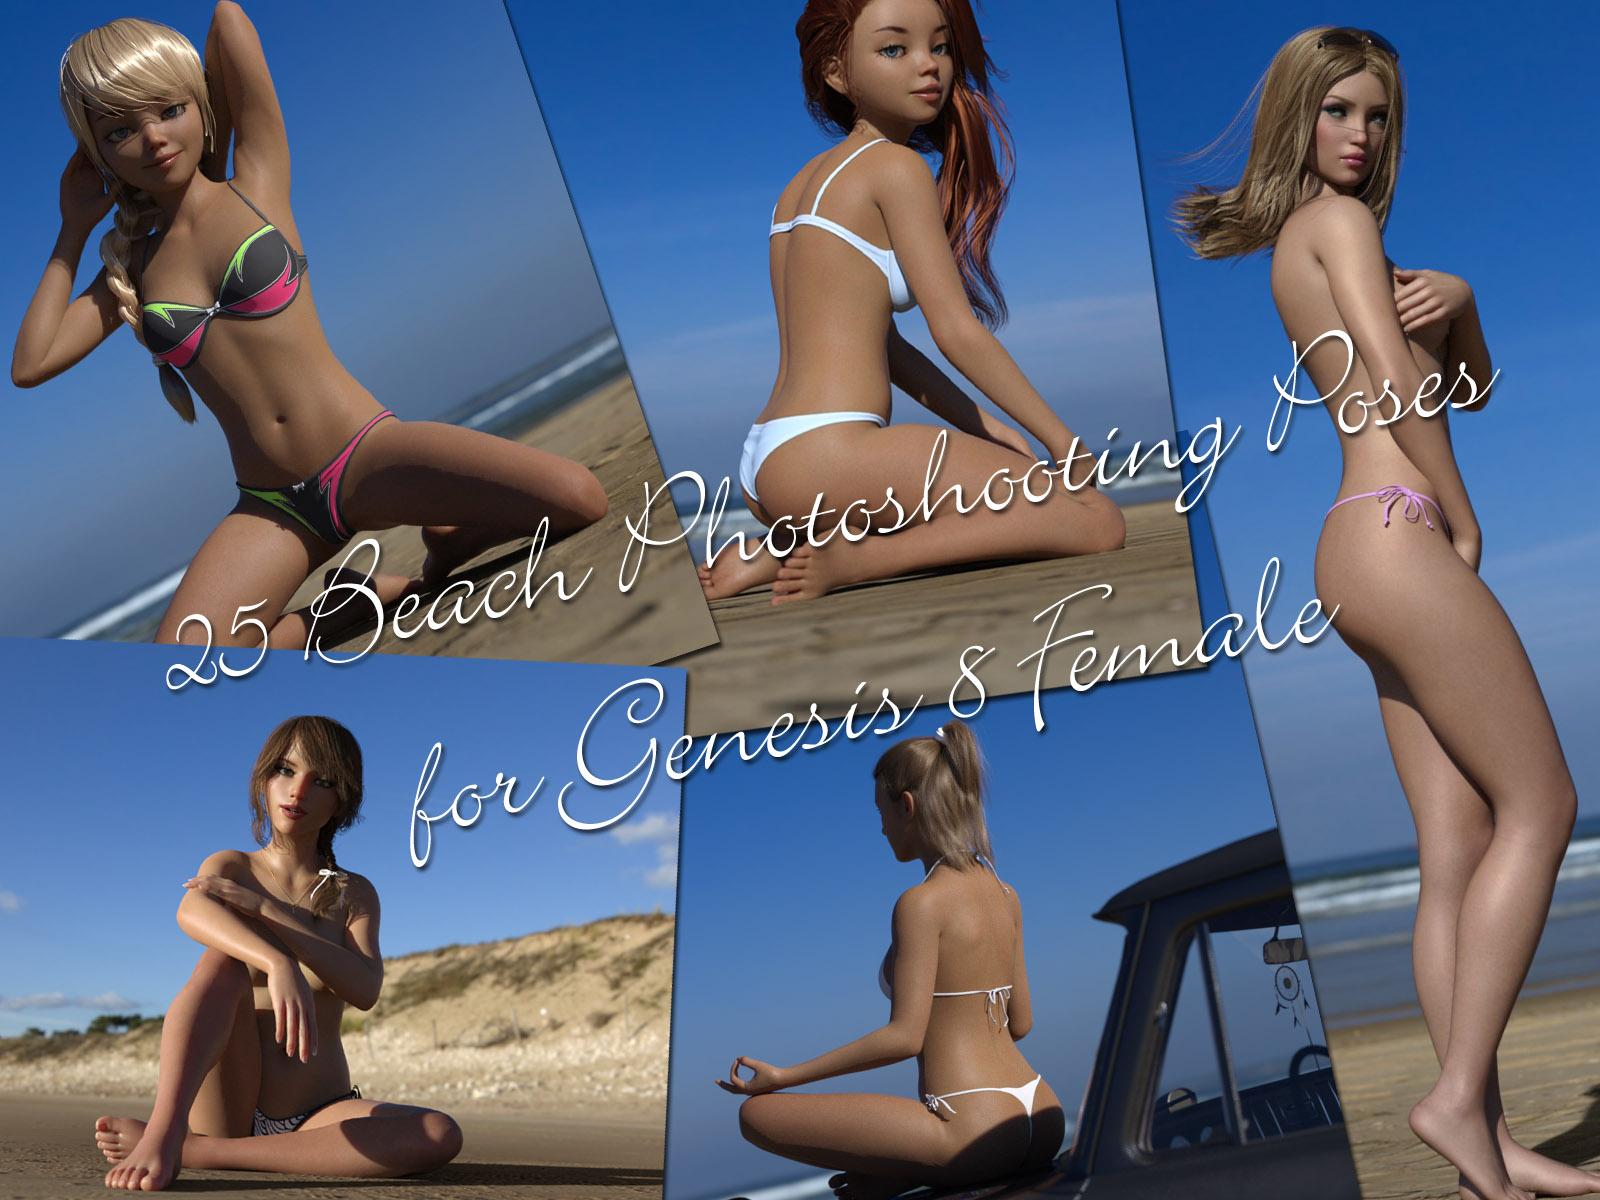 25 Beach Photoshooting Poses